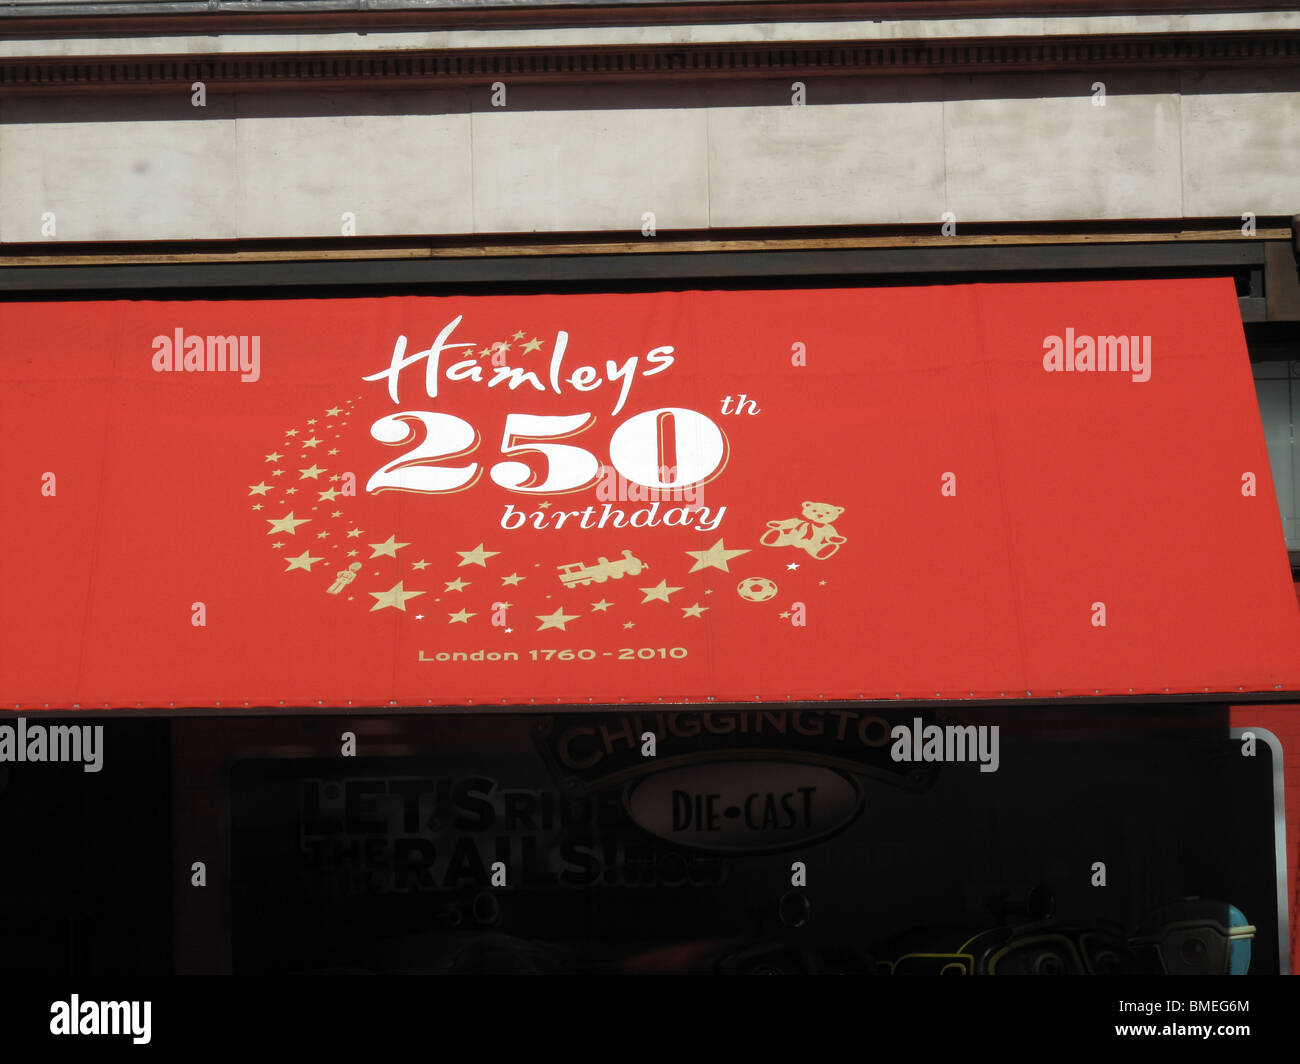 Hamleys 250th Anniversary Toys Shop - Stock Image